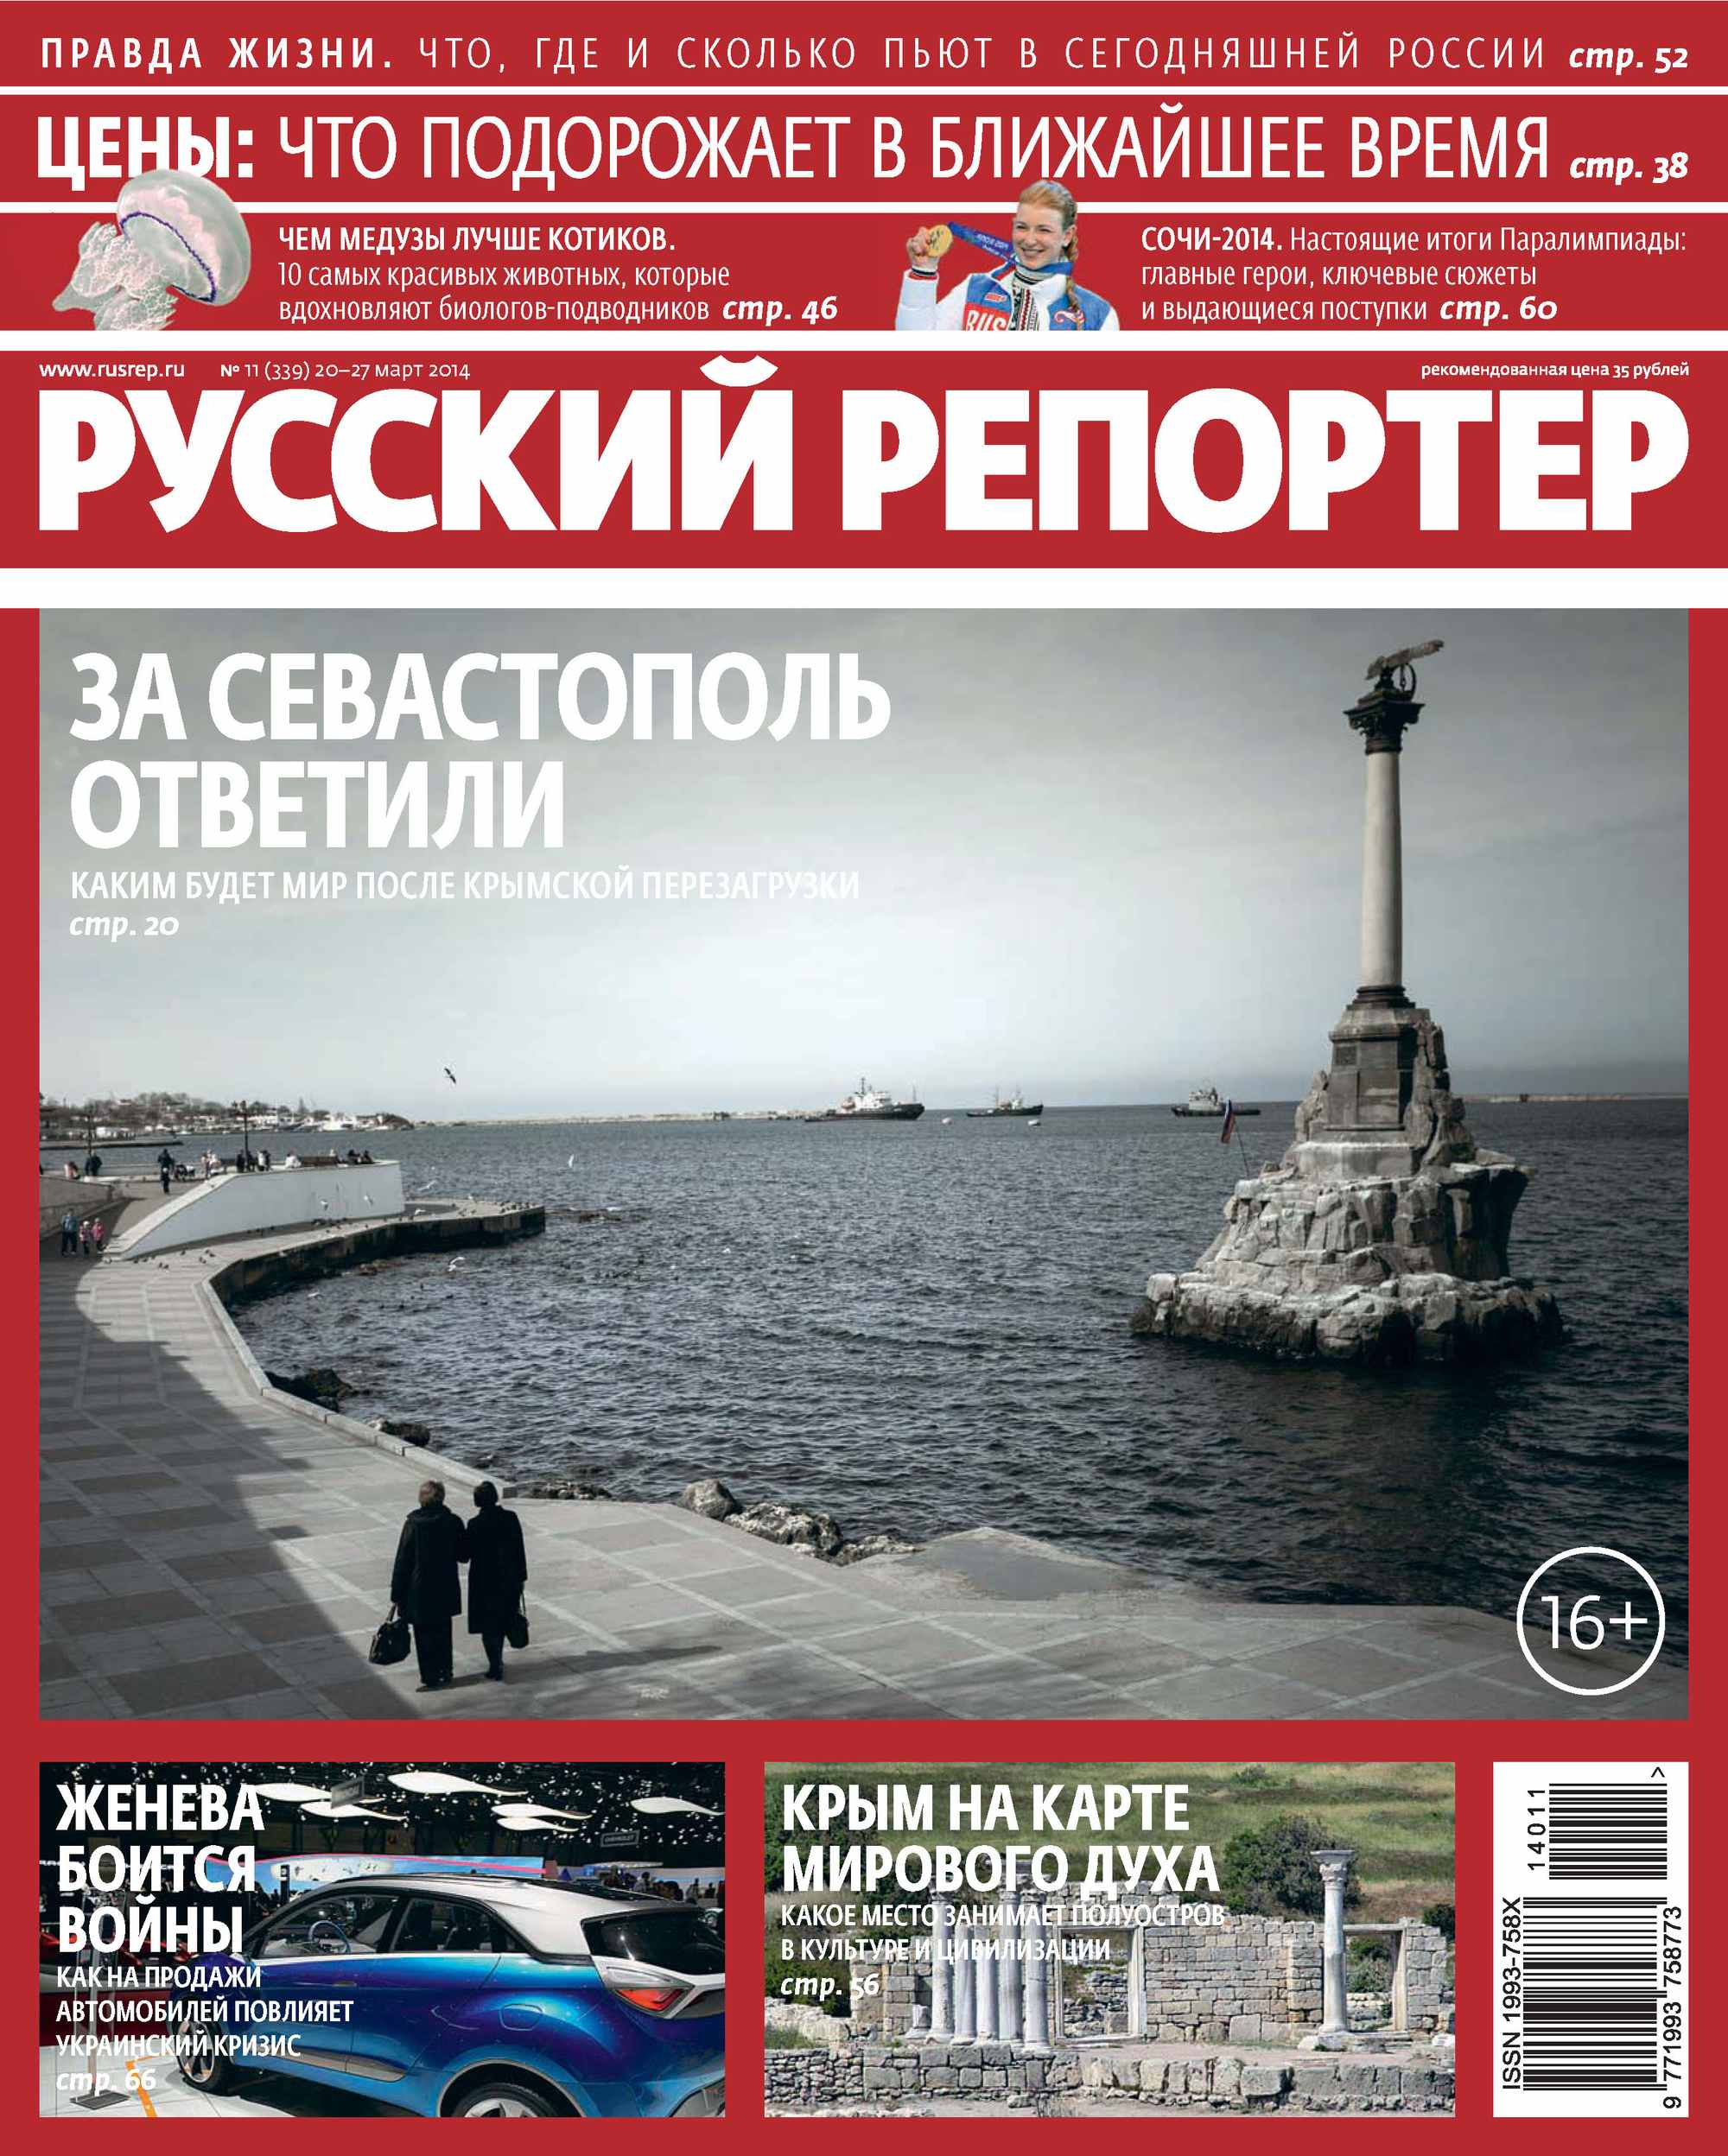 Русский Репортер №11/2014